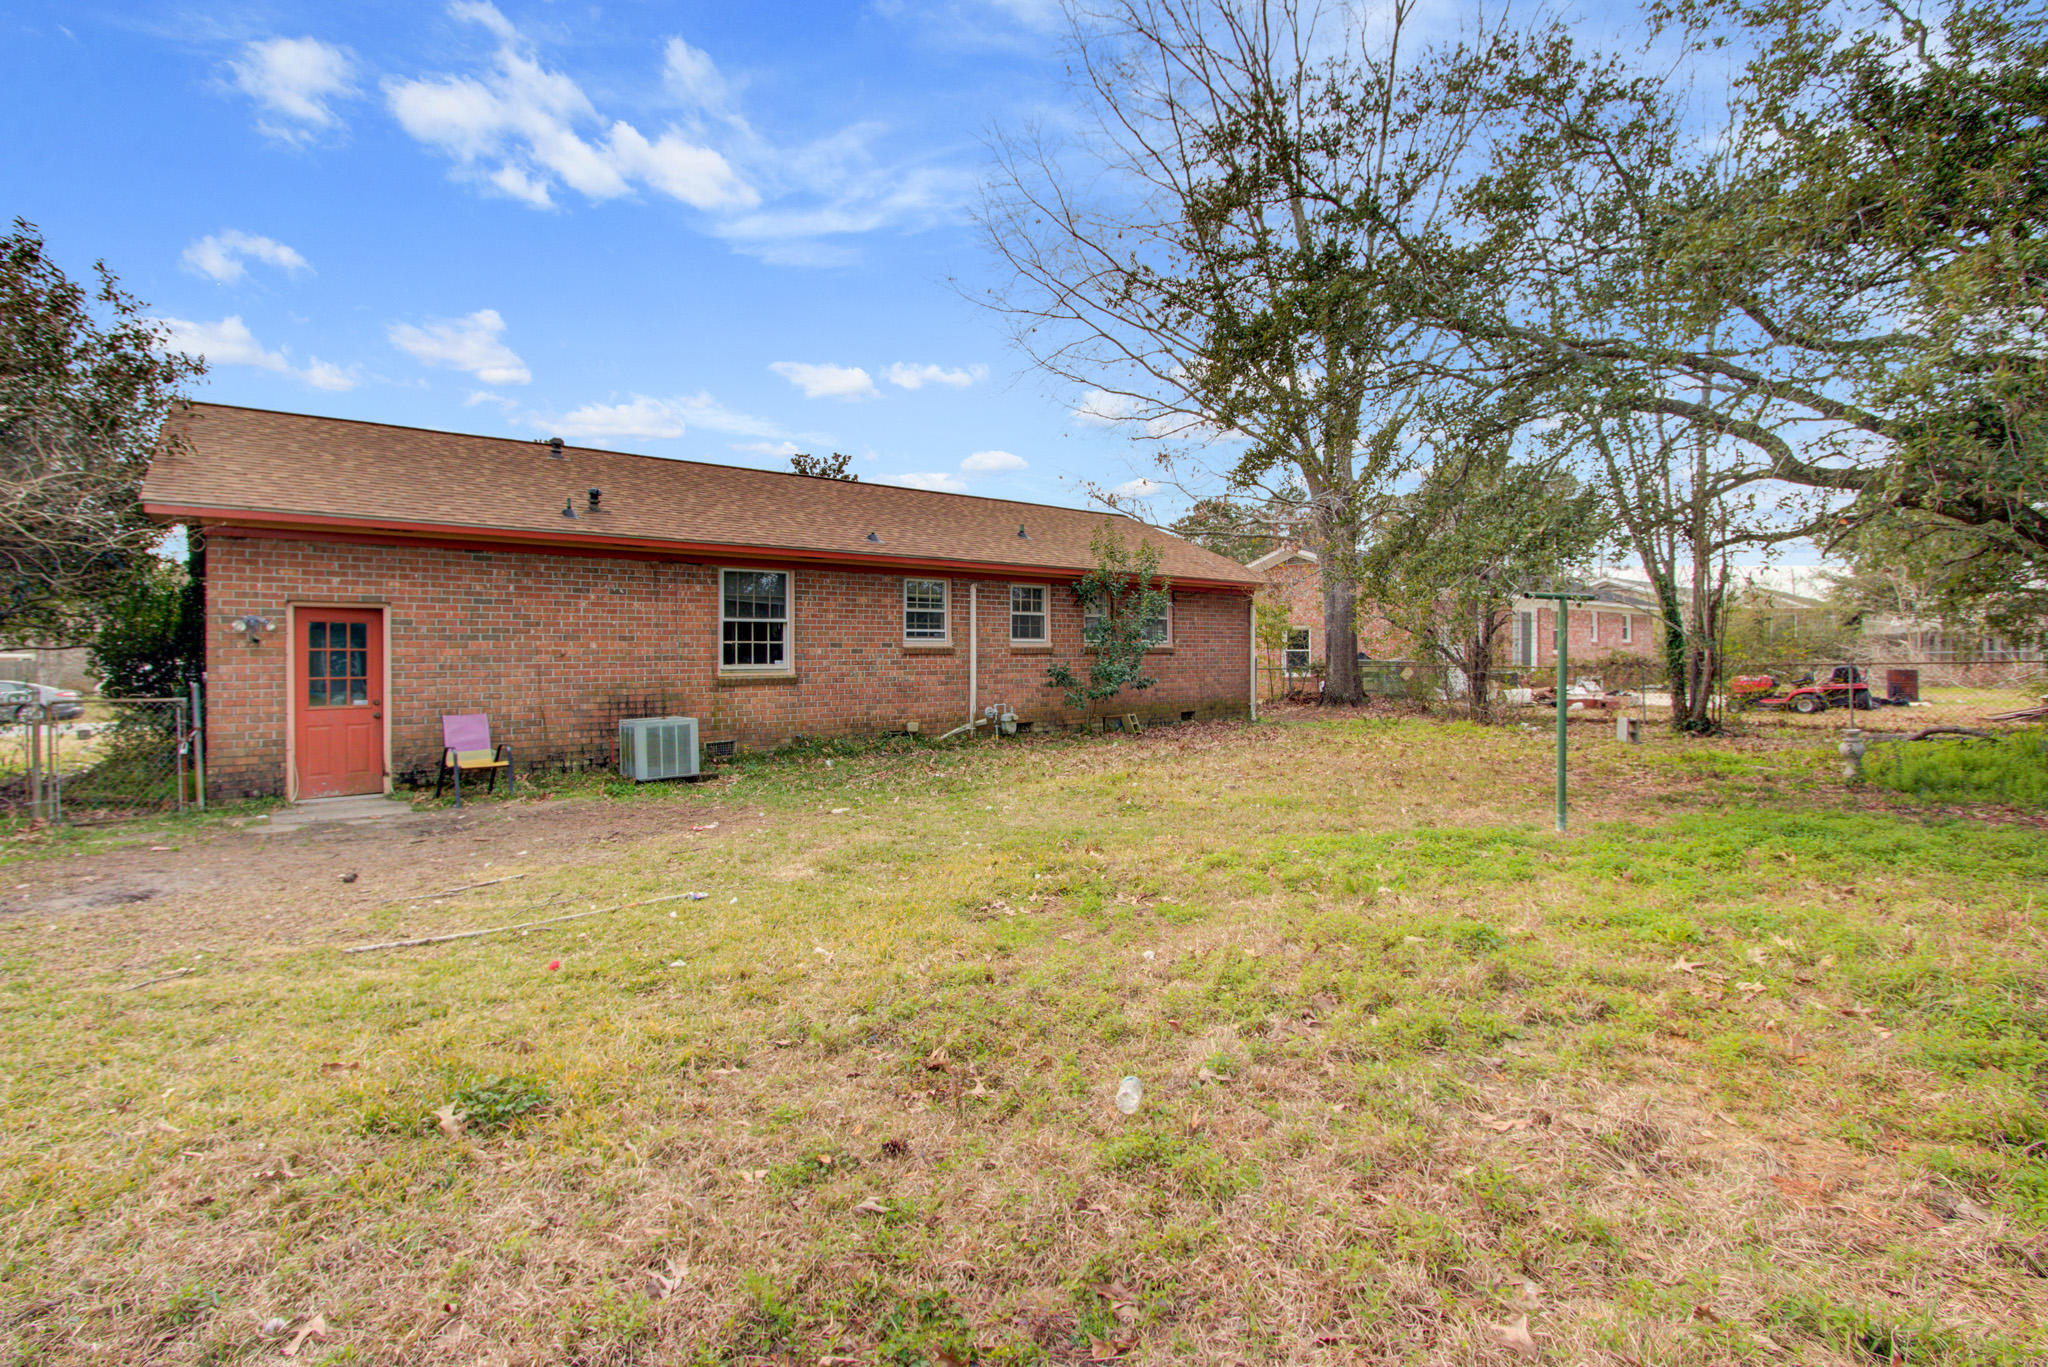 Bushy Park Terrace Homes For Sale - 125 Azalea, Goose Creek, SC - 18